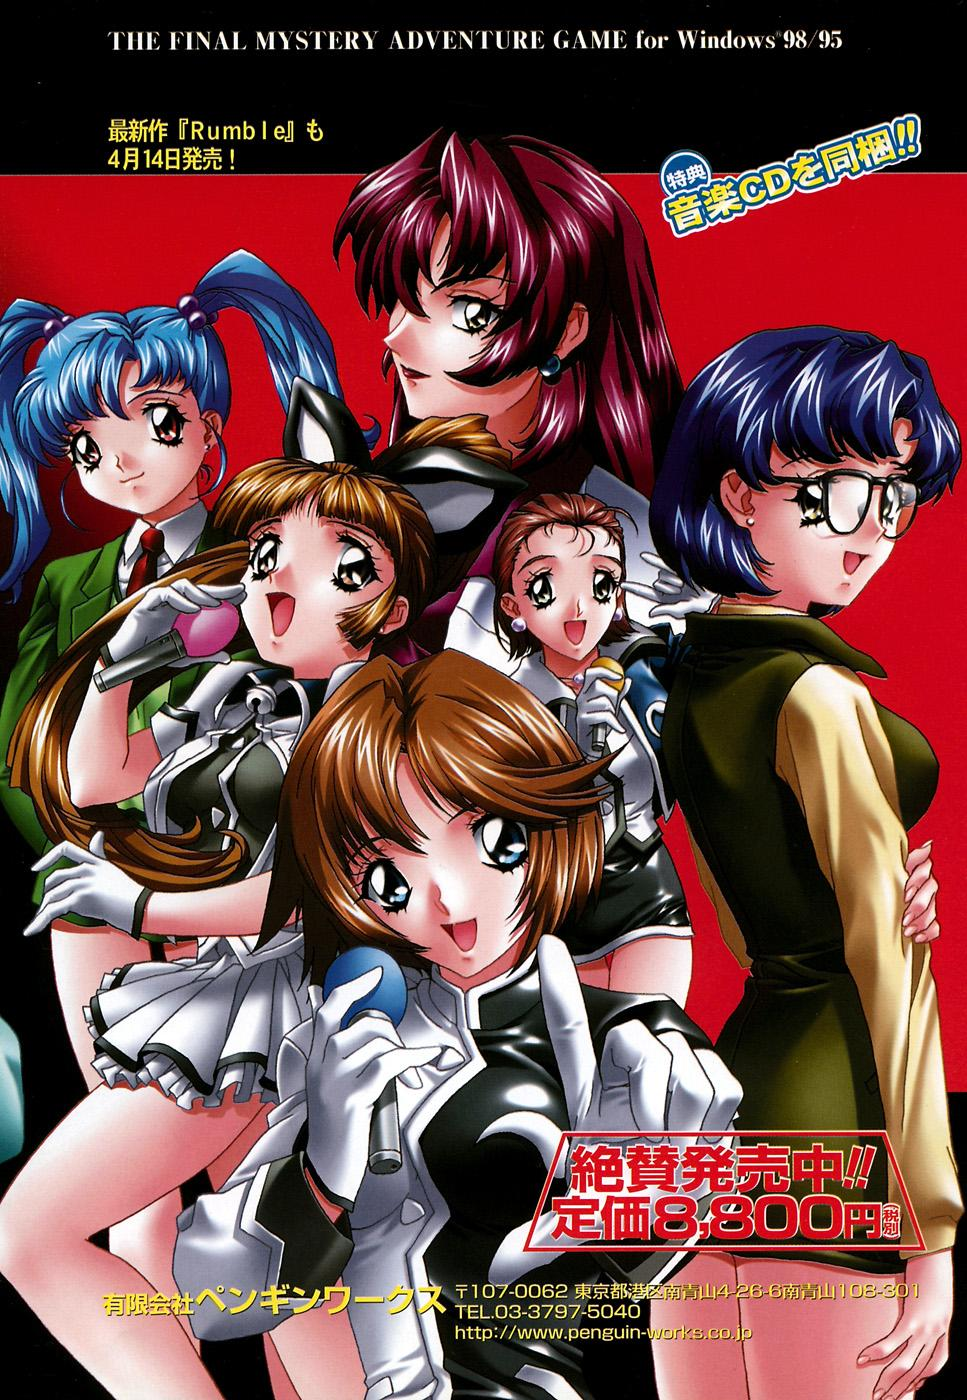 G-drive Vol.1 Ryoujokuhen 7